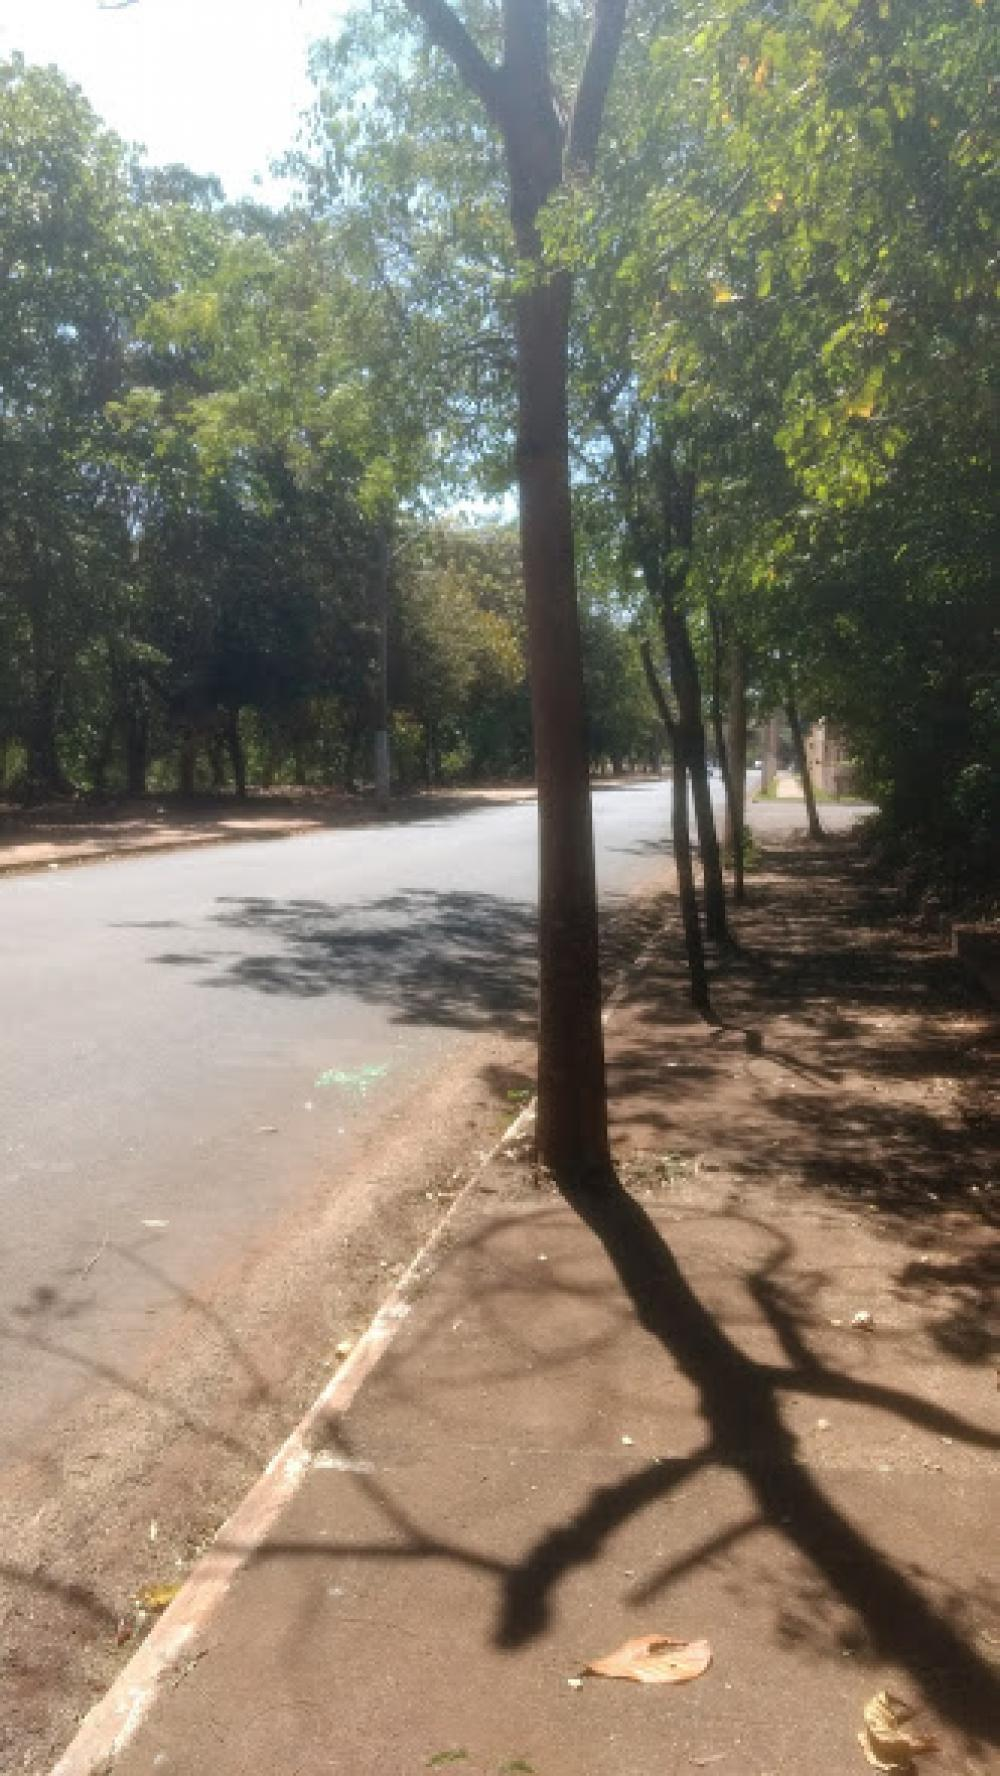 Comprar Terreno / Área em Olimpia R$ 860.000,00 - Foto 13